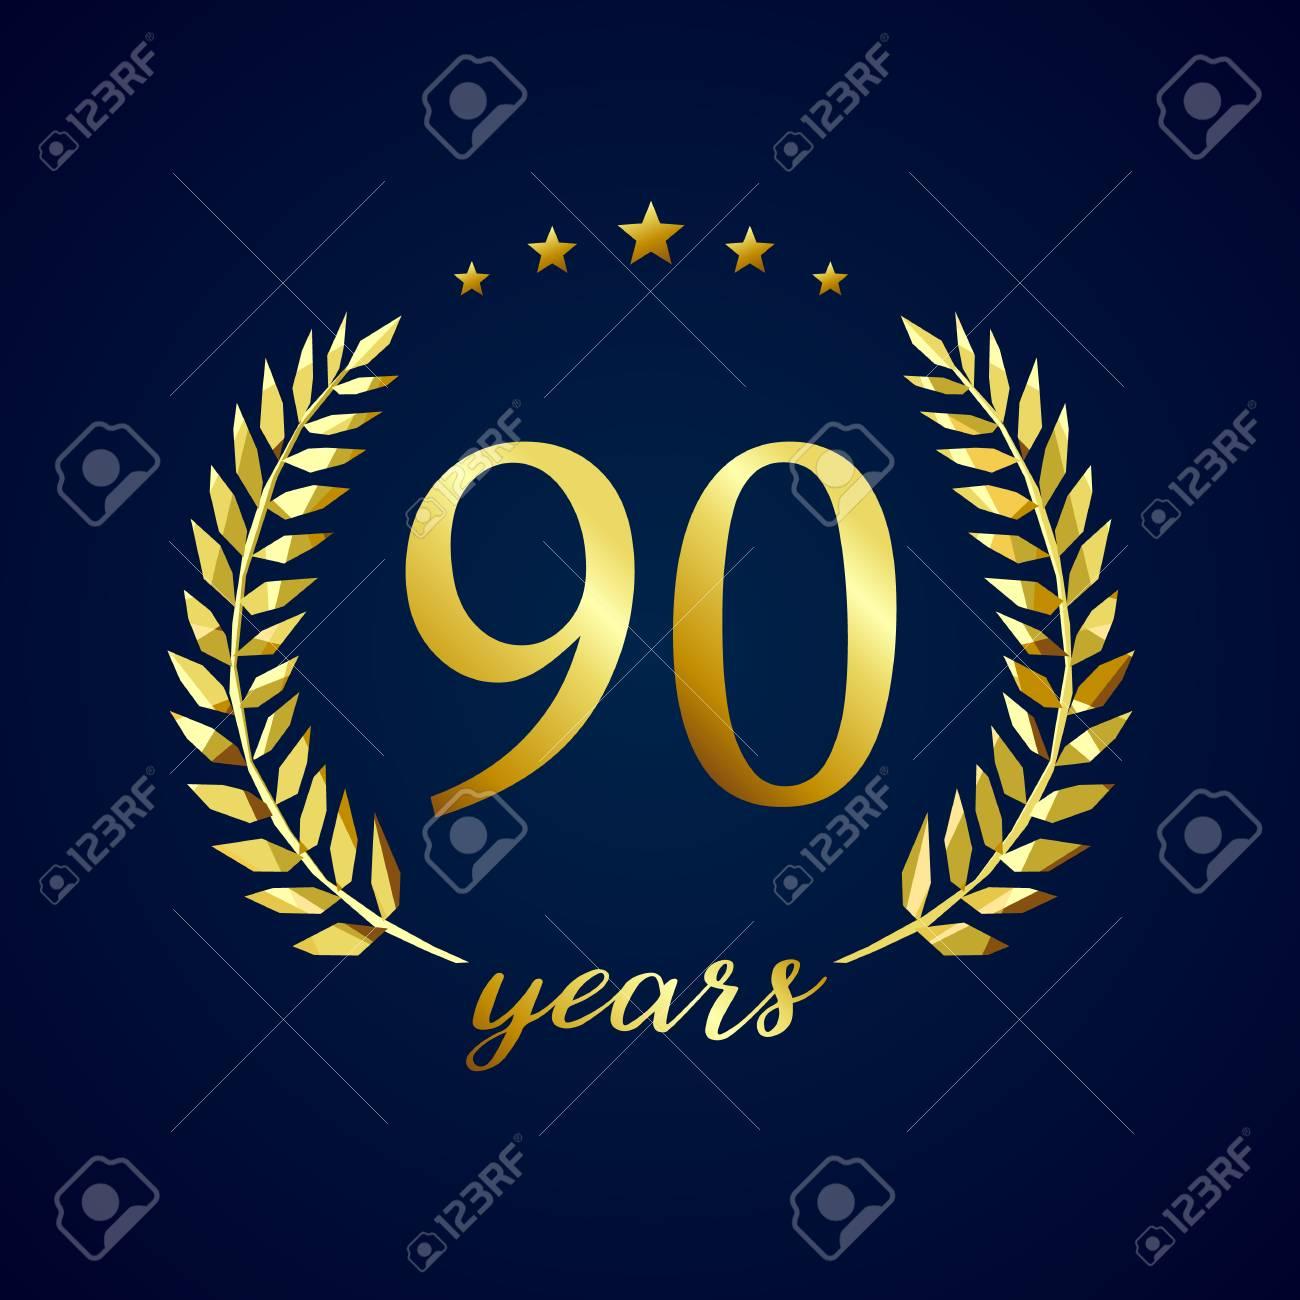 90 years old luxury logotype. Congratulating 90th. - 87822313